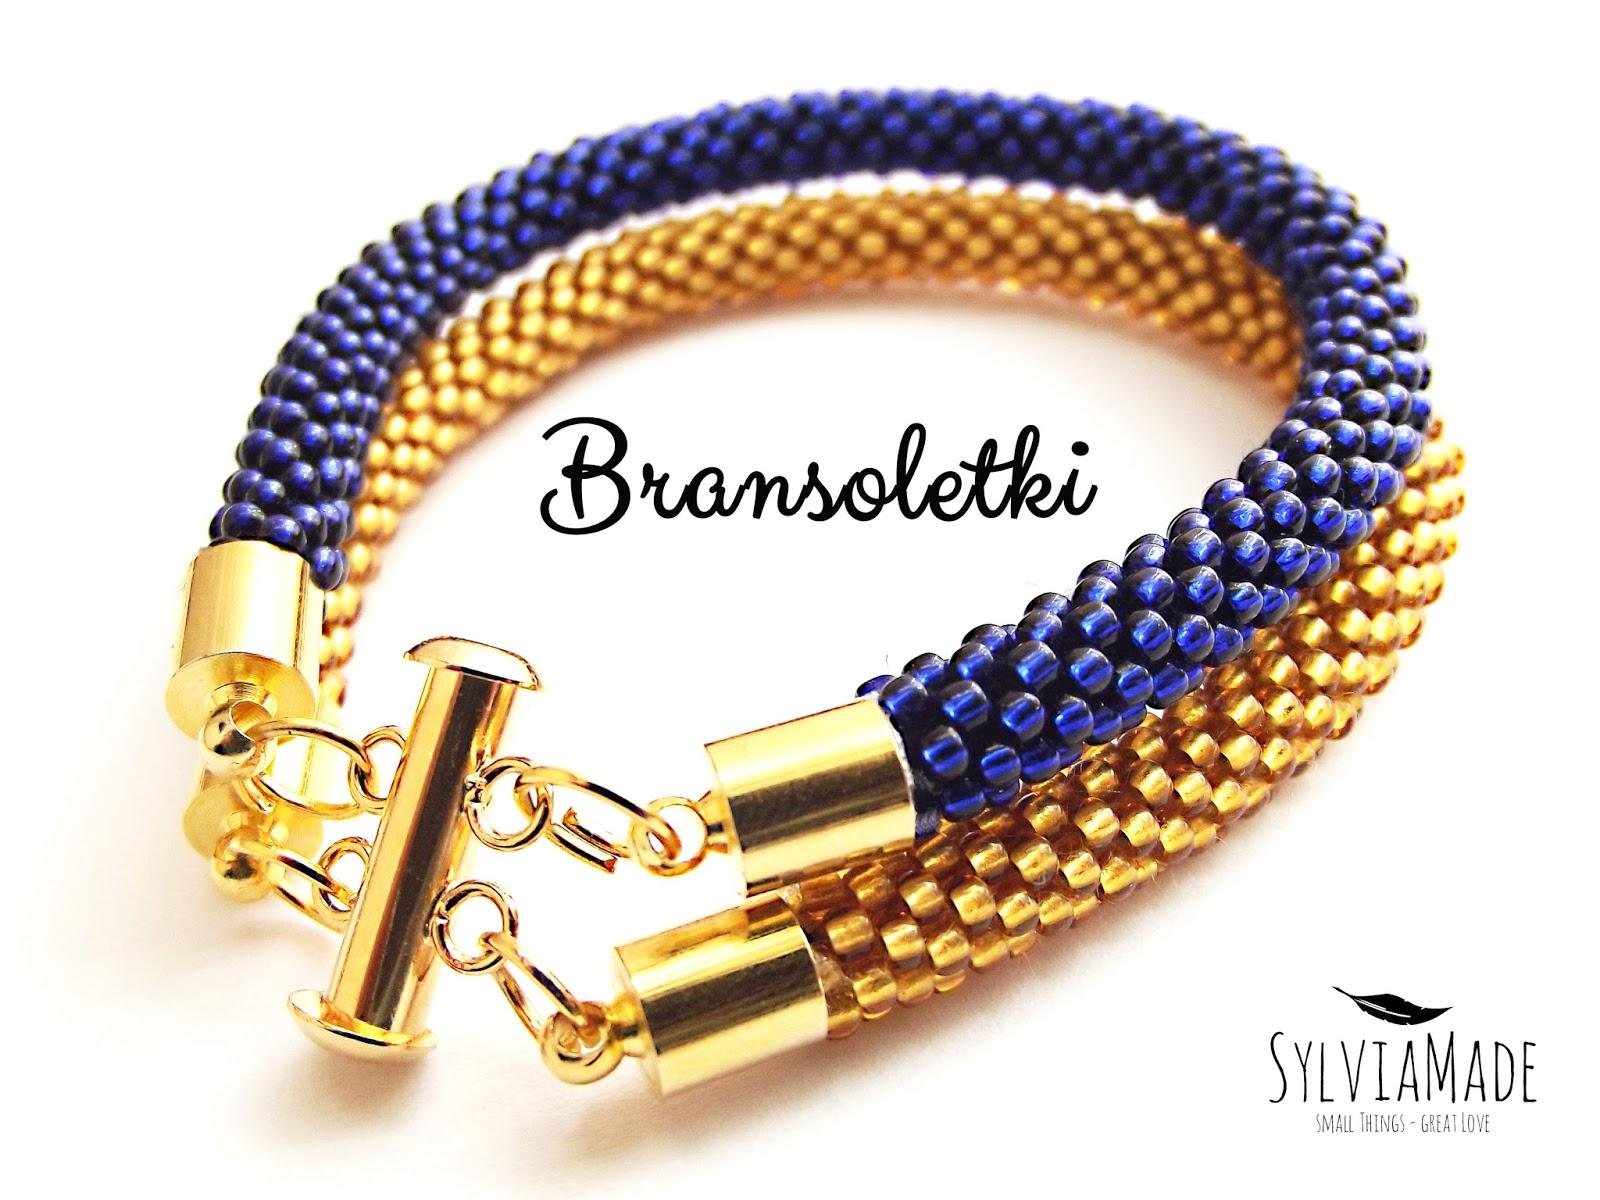 http://sylviamade.blogspot.com/p/bransoletki.html